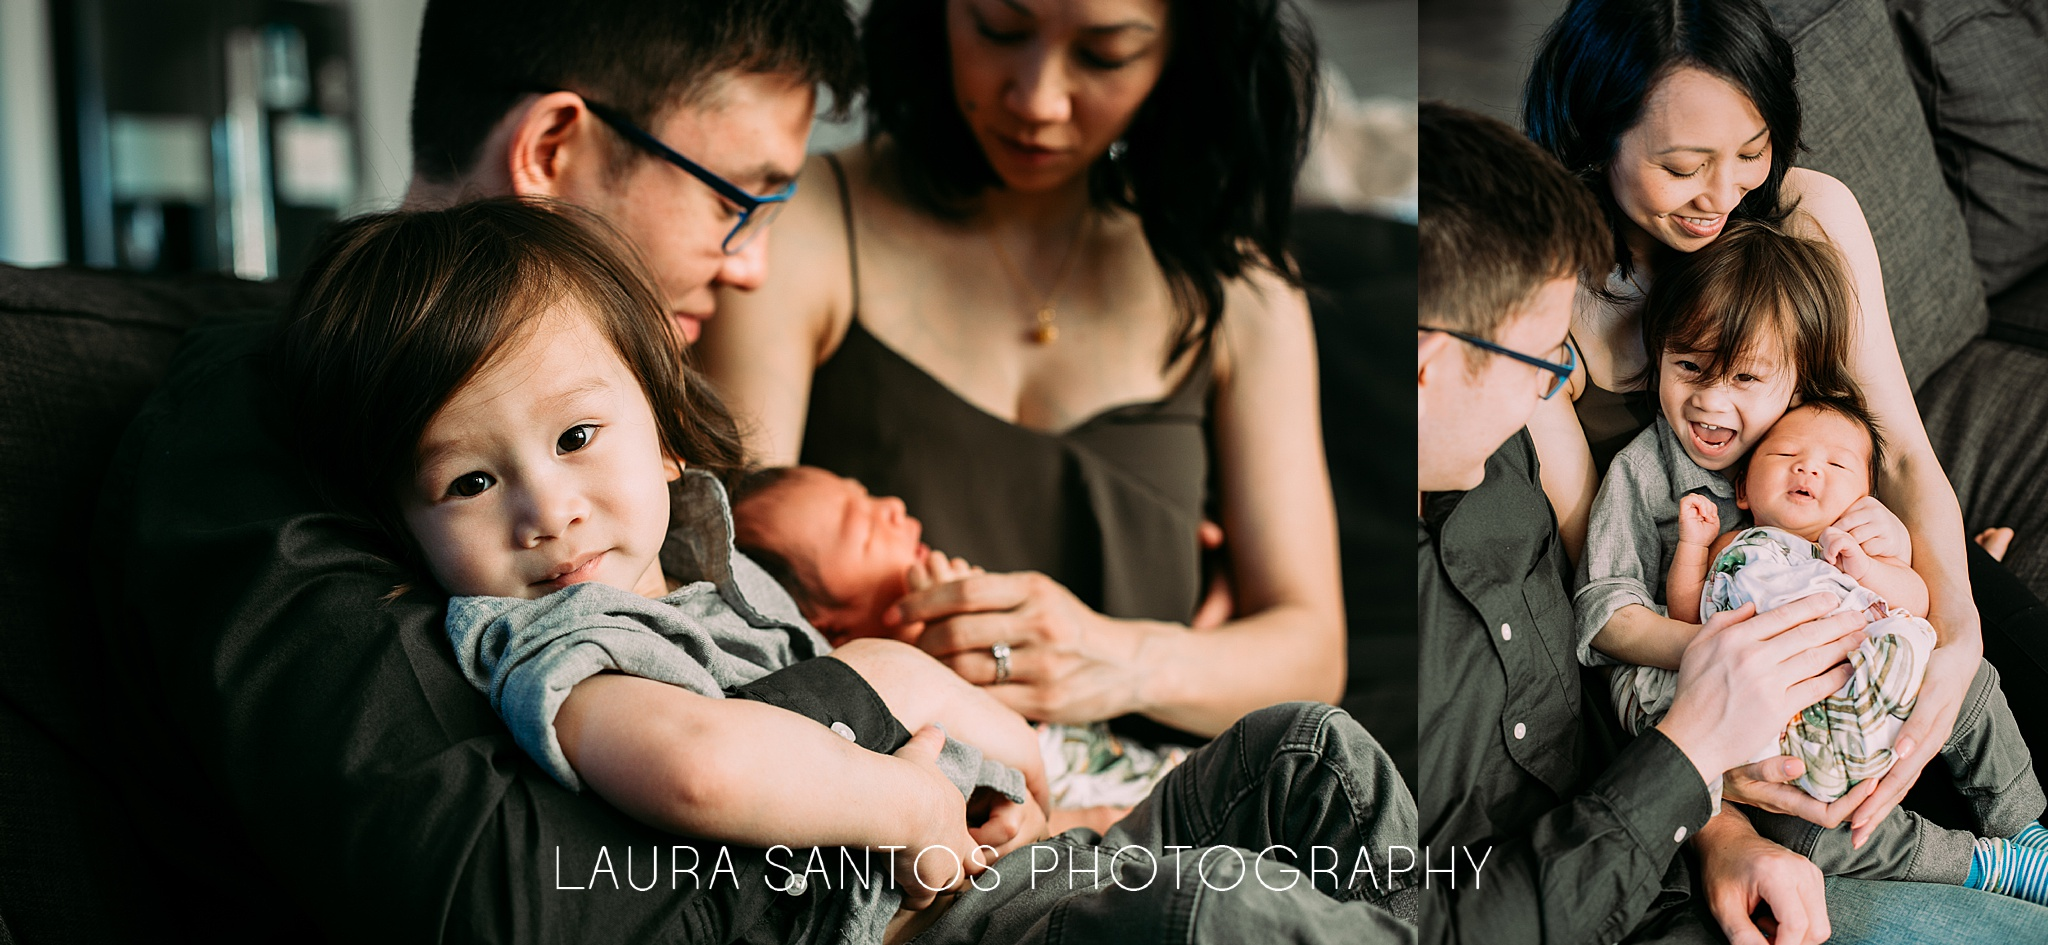 Laura Santos Photography Portland Oregon Family Photographer_0598.jpg